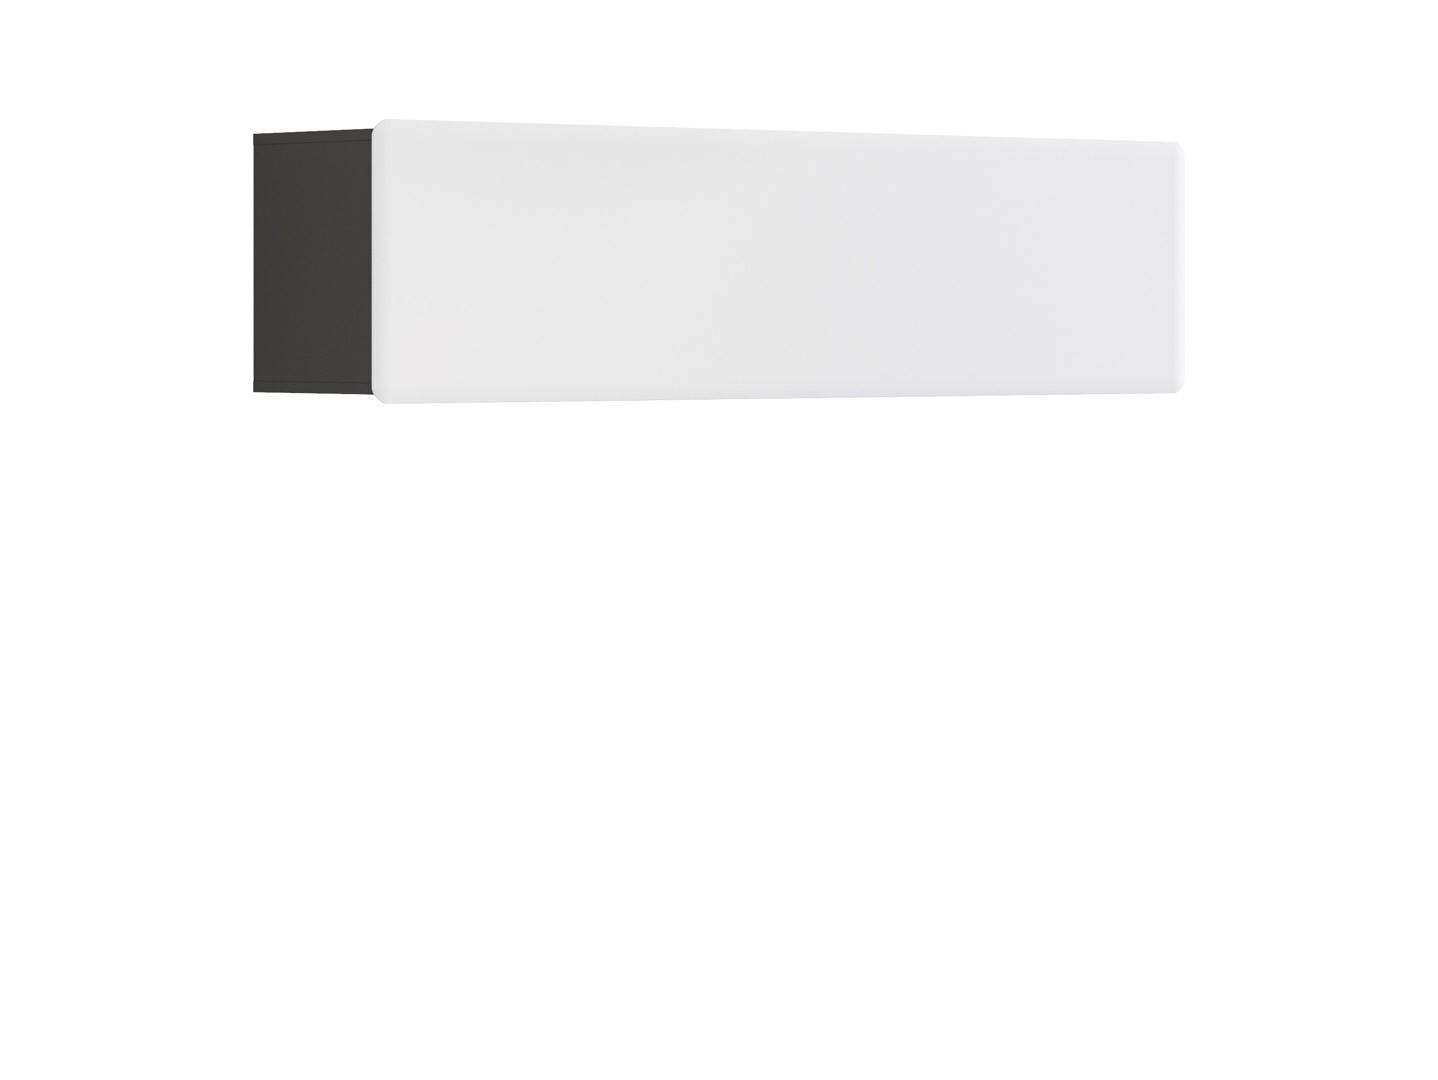 Polička - BRW - Possi Light - SFW1K/4/16 (šedý wolfram + lesk bílý)